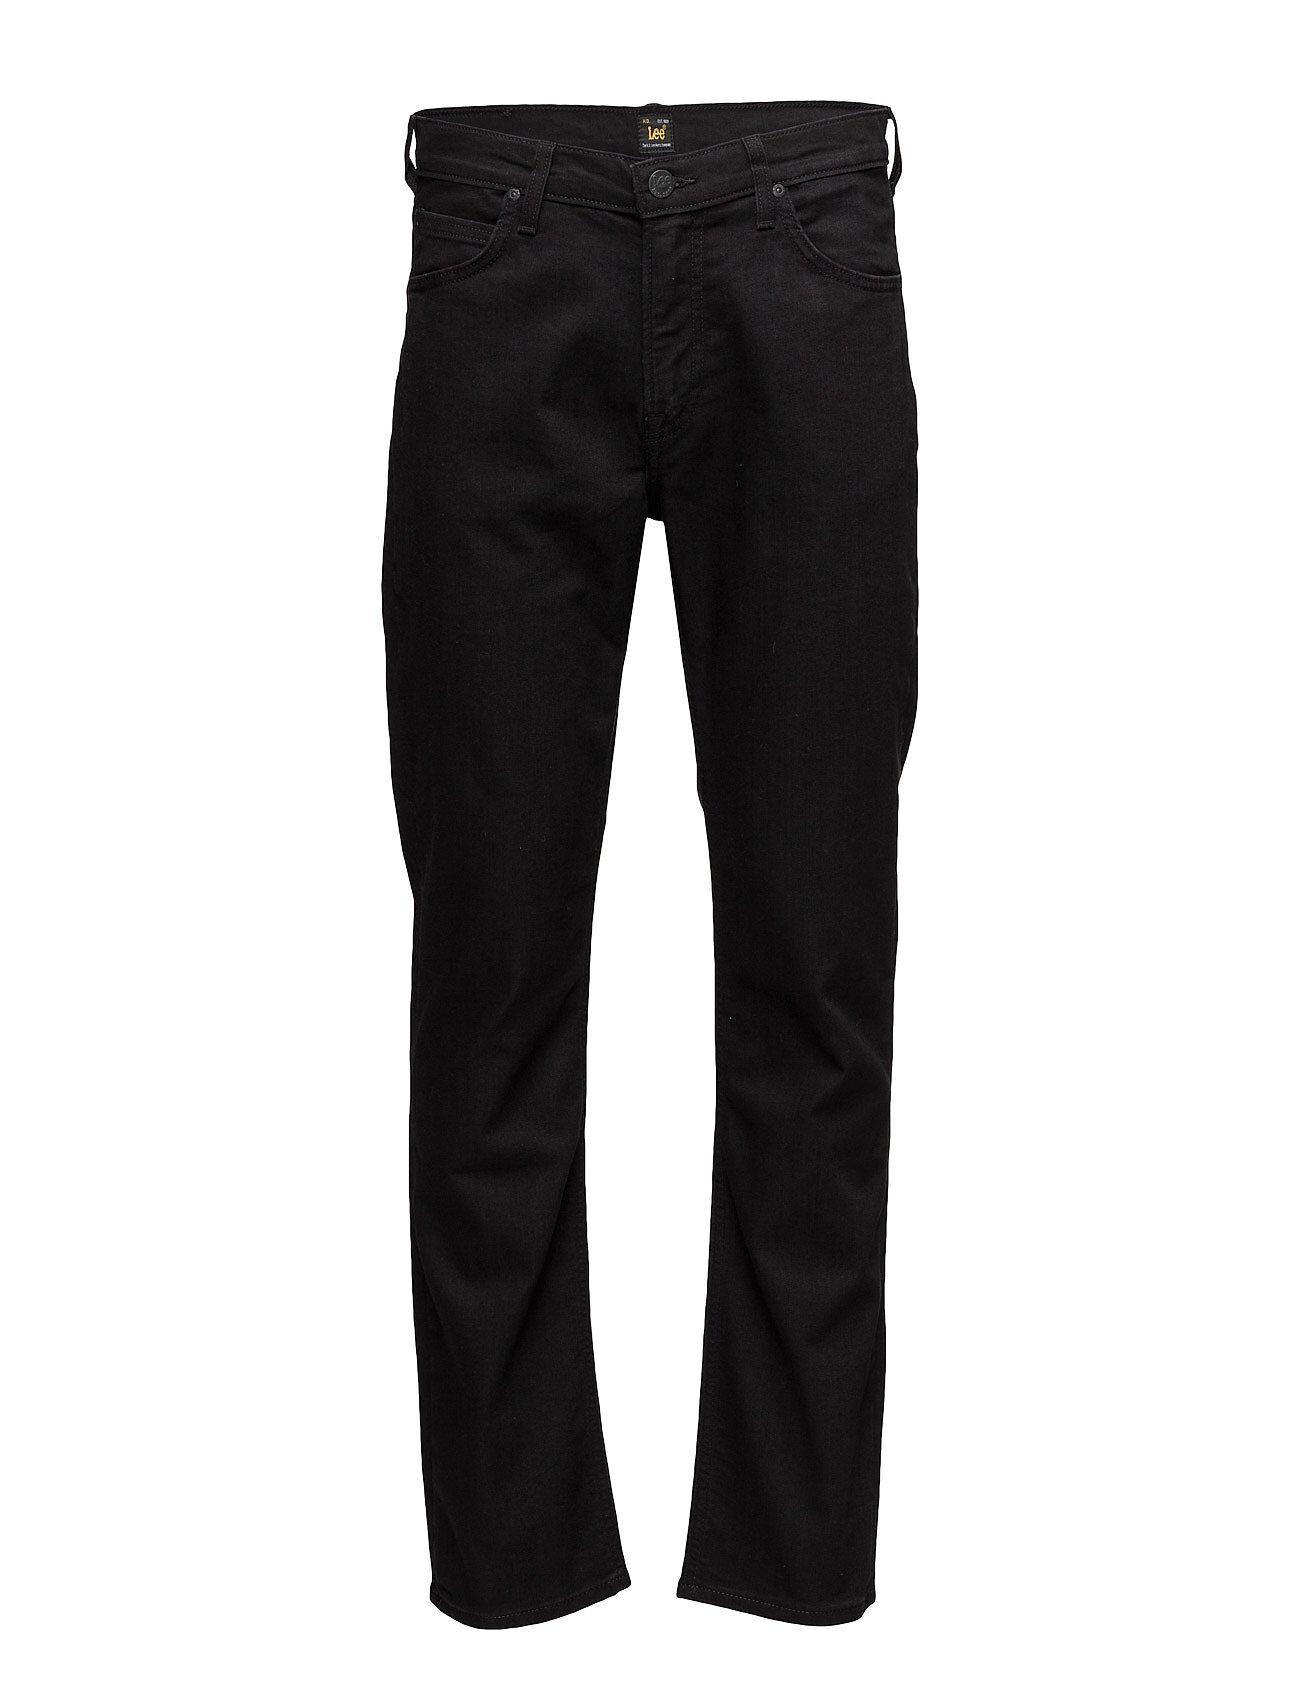 Lee Jeans Morton Black Rinse